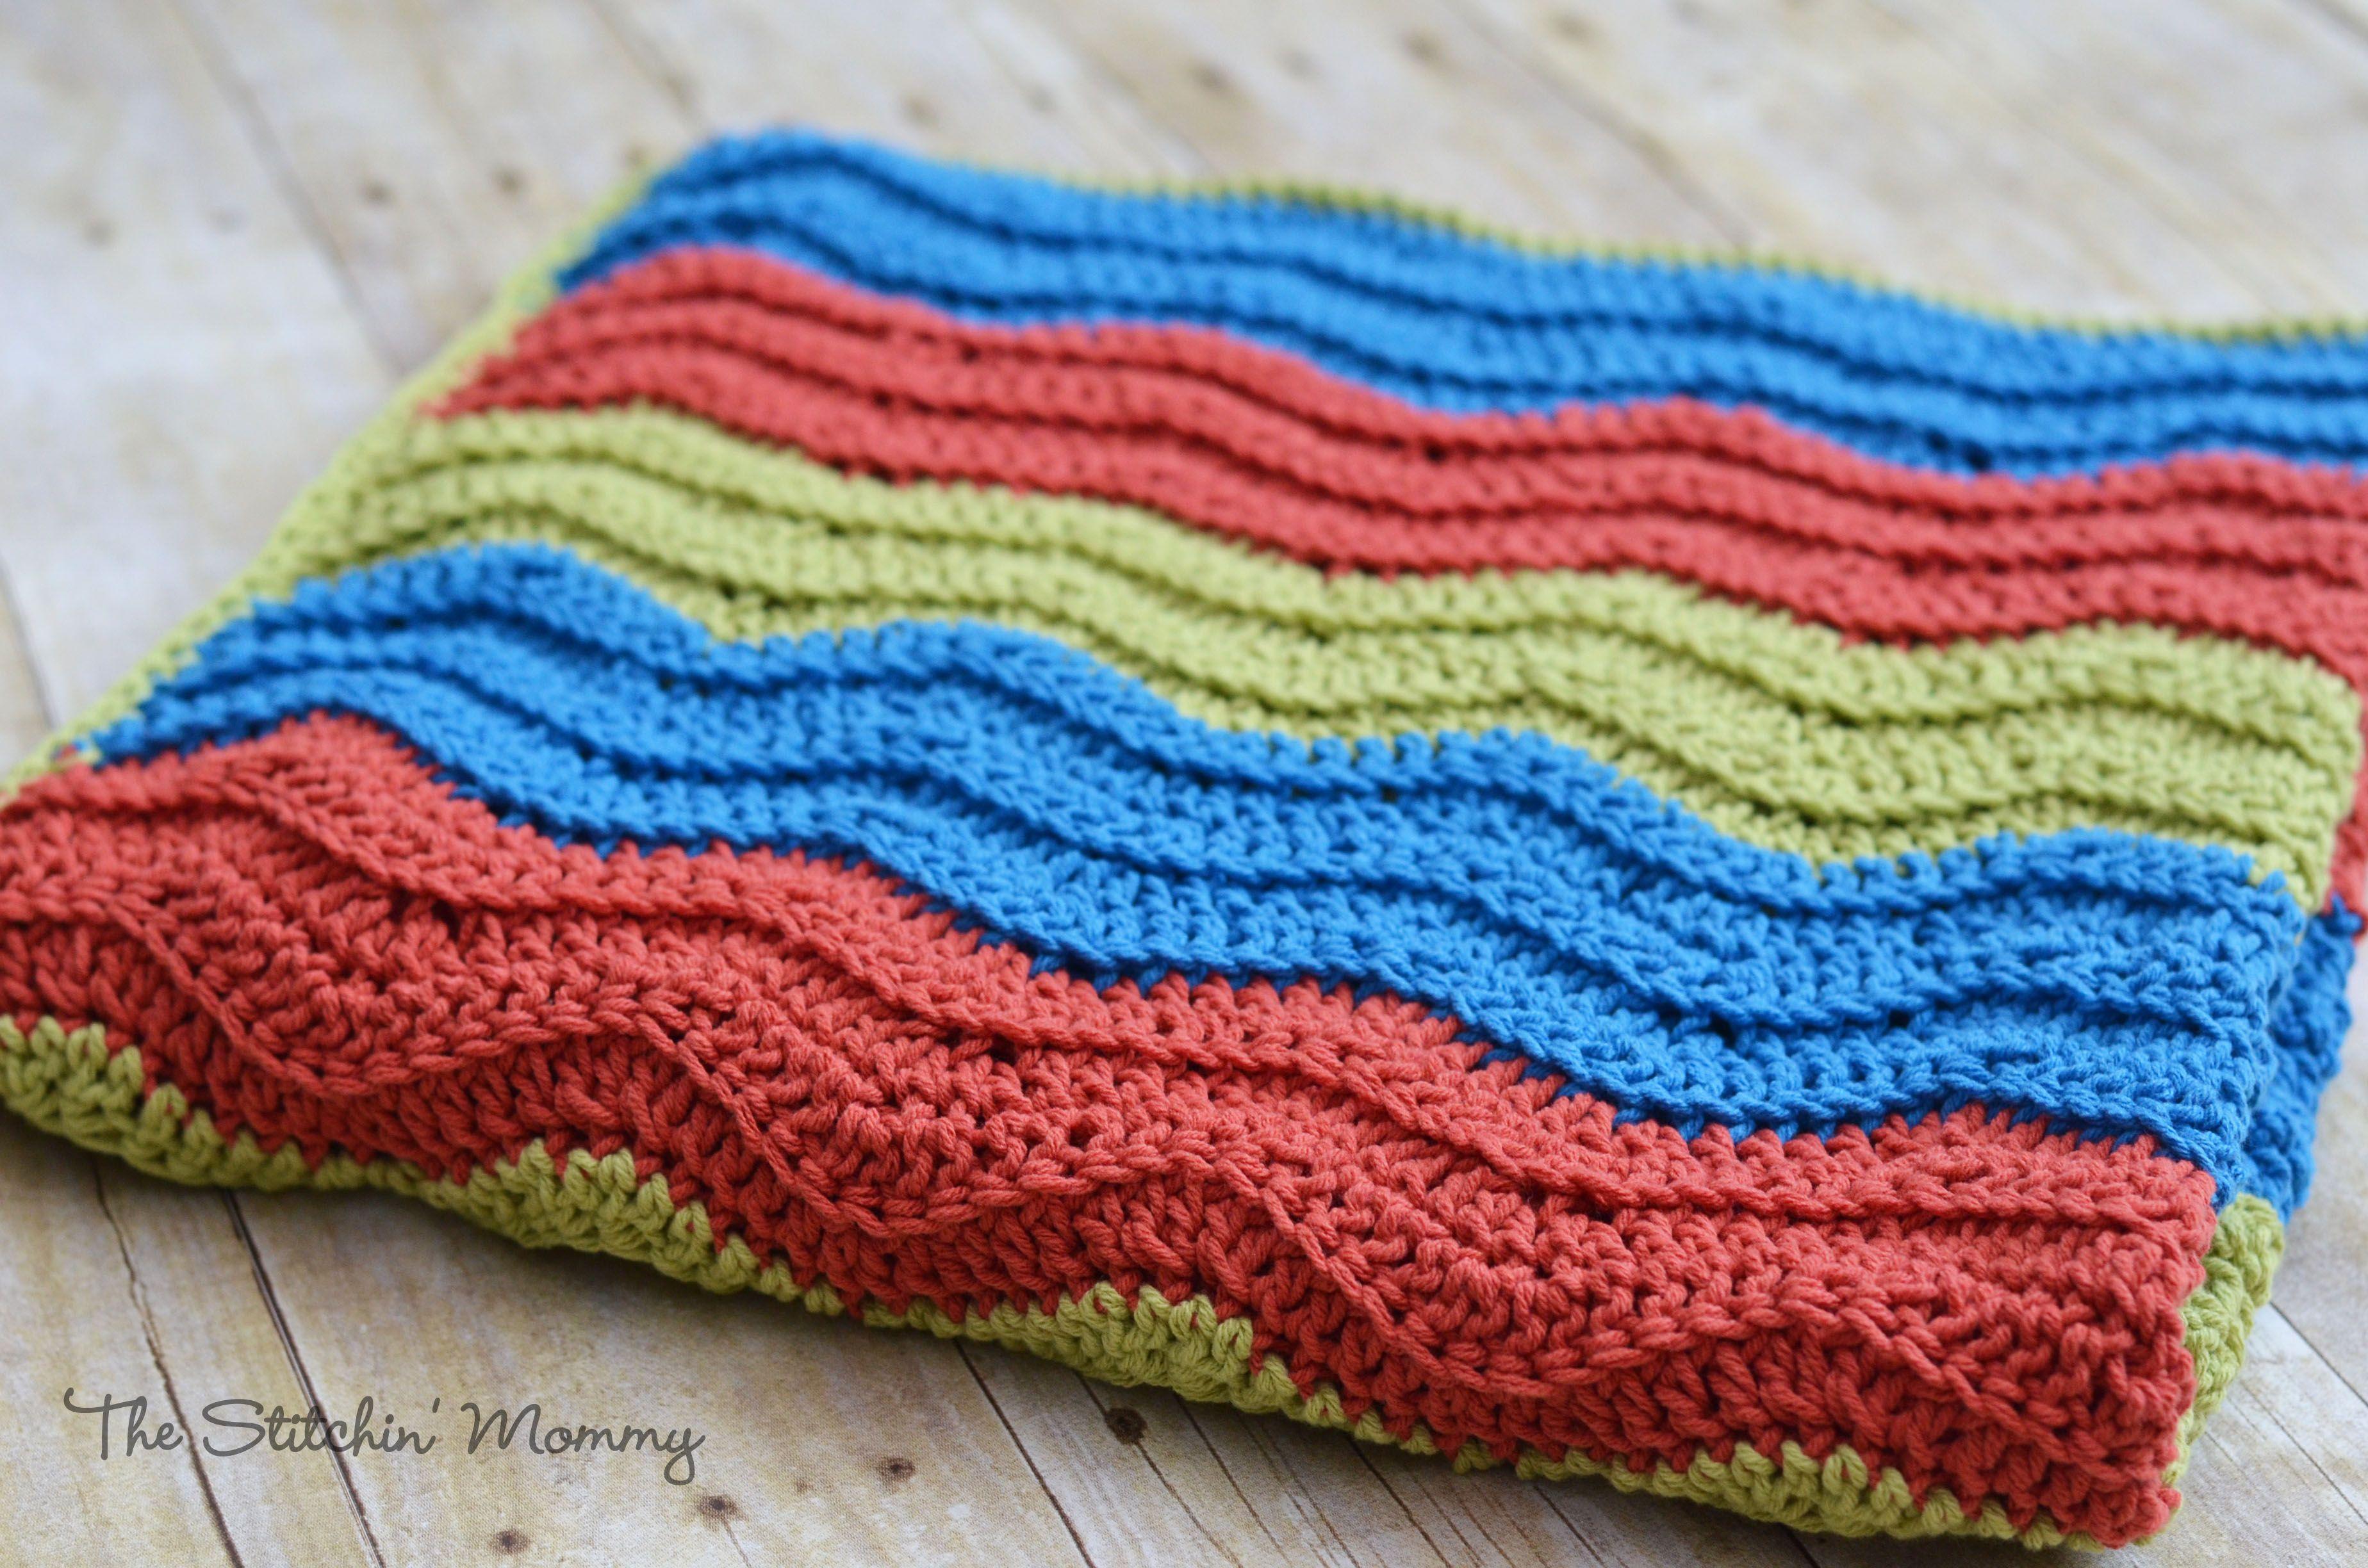 Amigurumi Vivi Free Patterns : Shell stitch baby blanket free pattern crochet ripple blanket